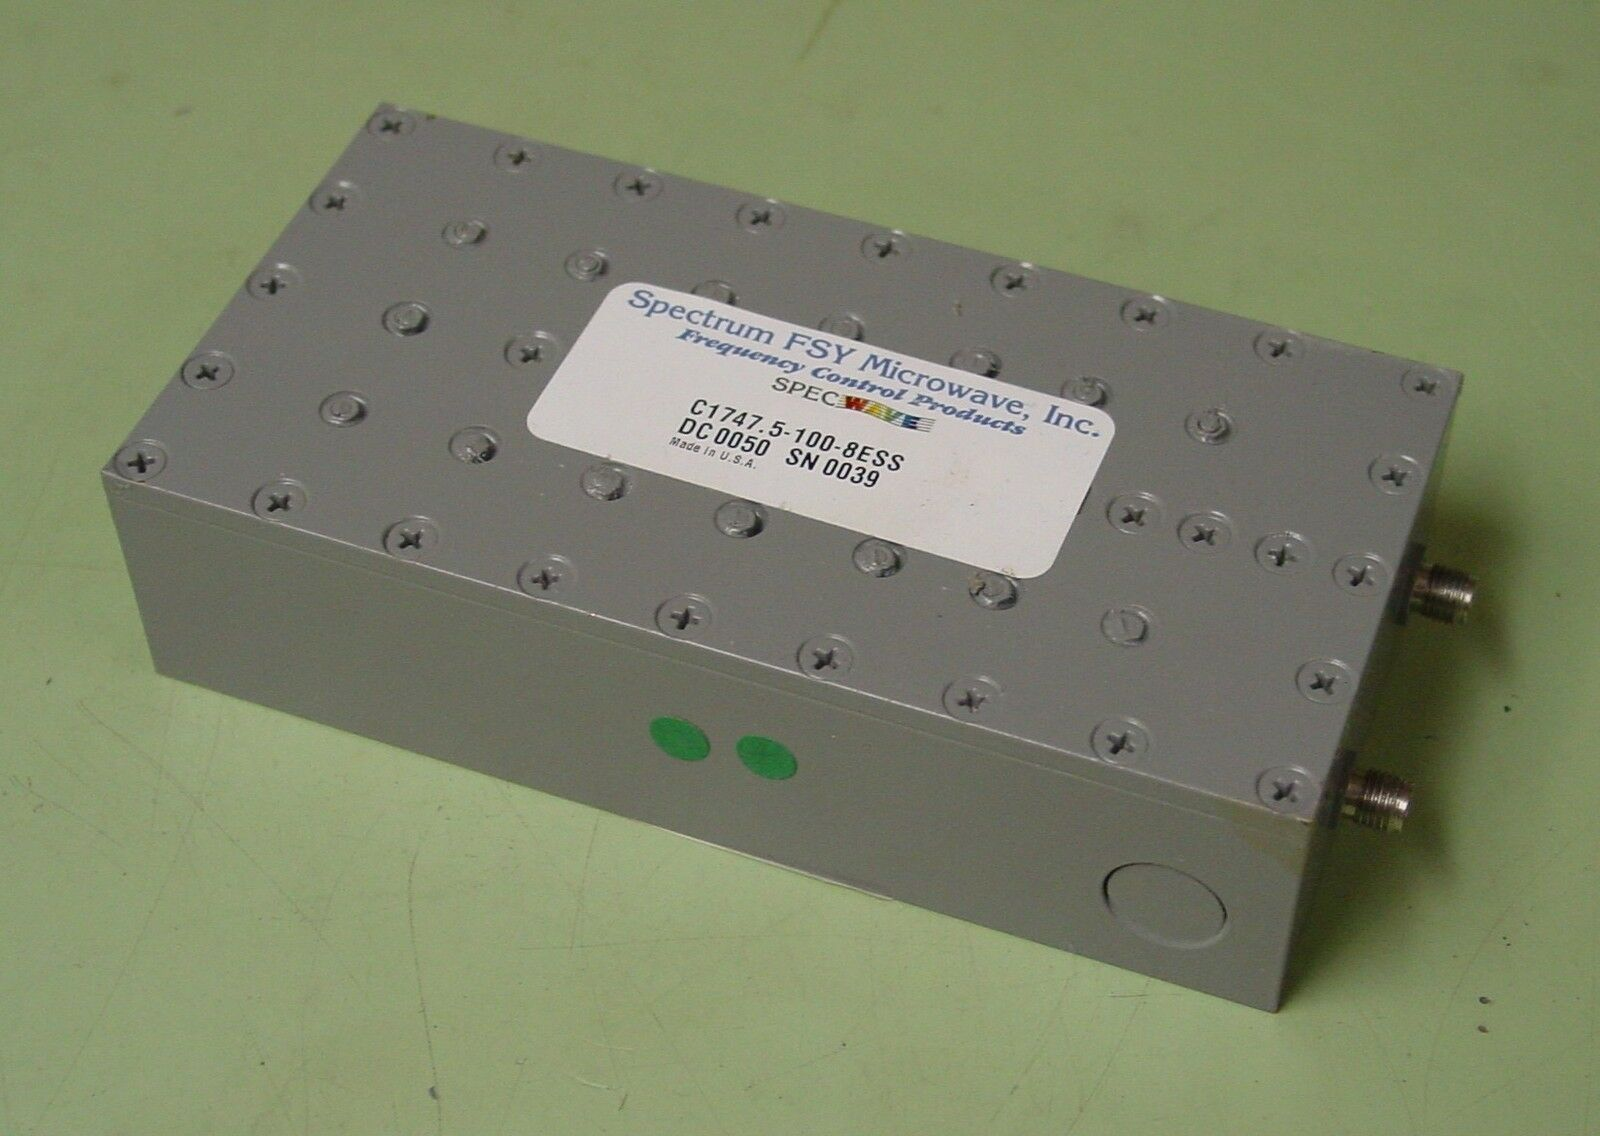 Spectrum Fsy Microwave 1747 5 Mhz Rf Bandp Filter